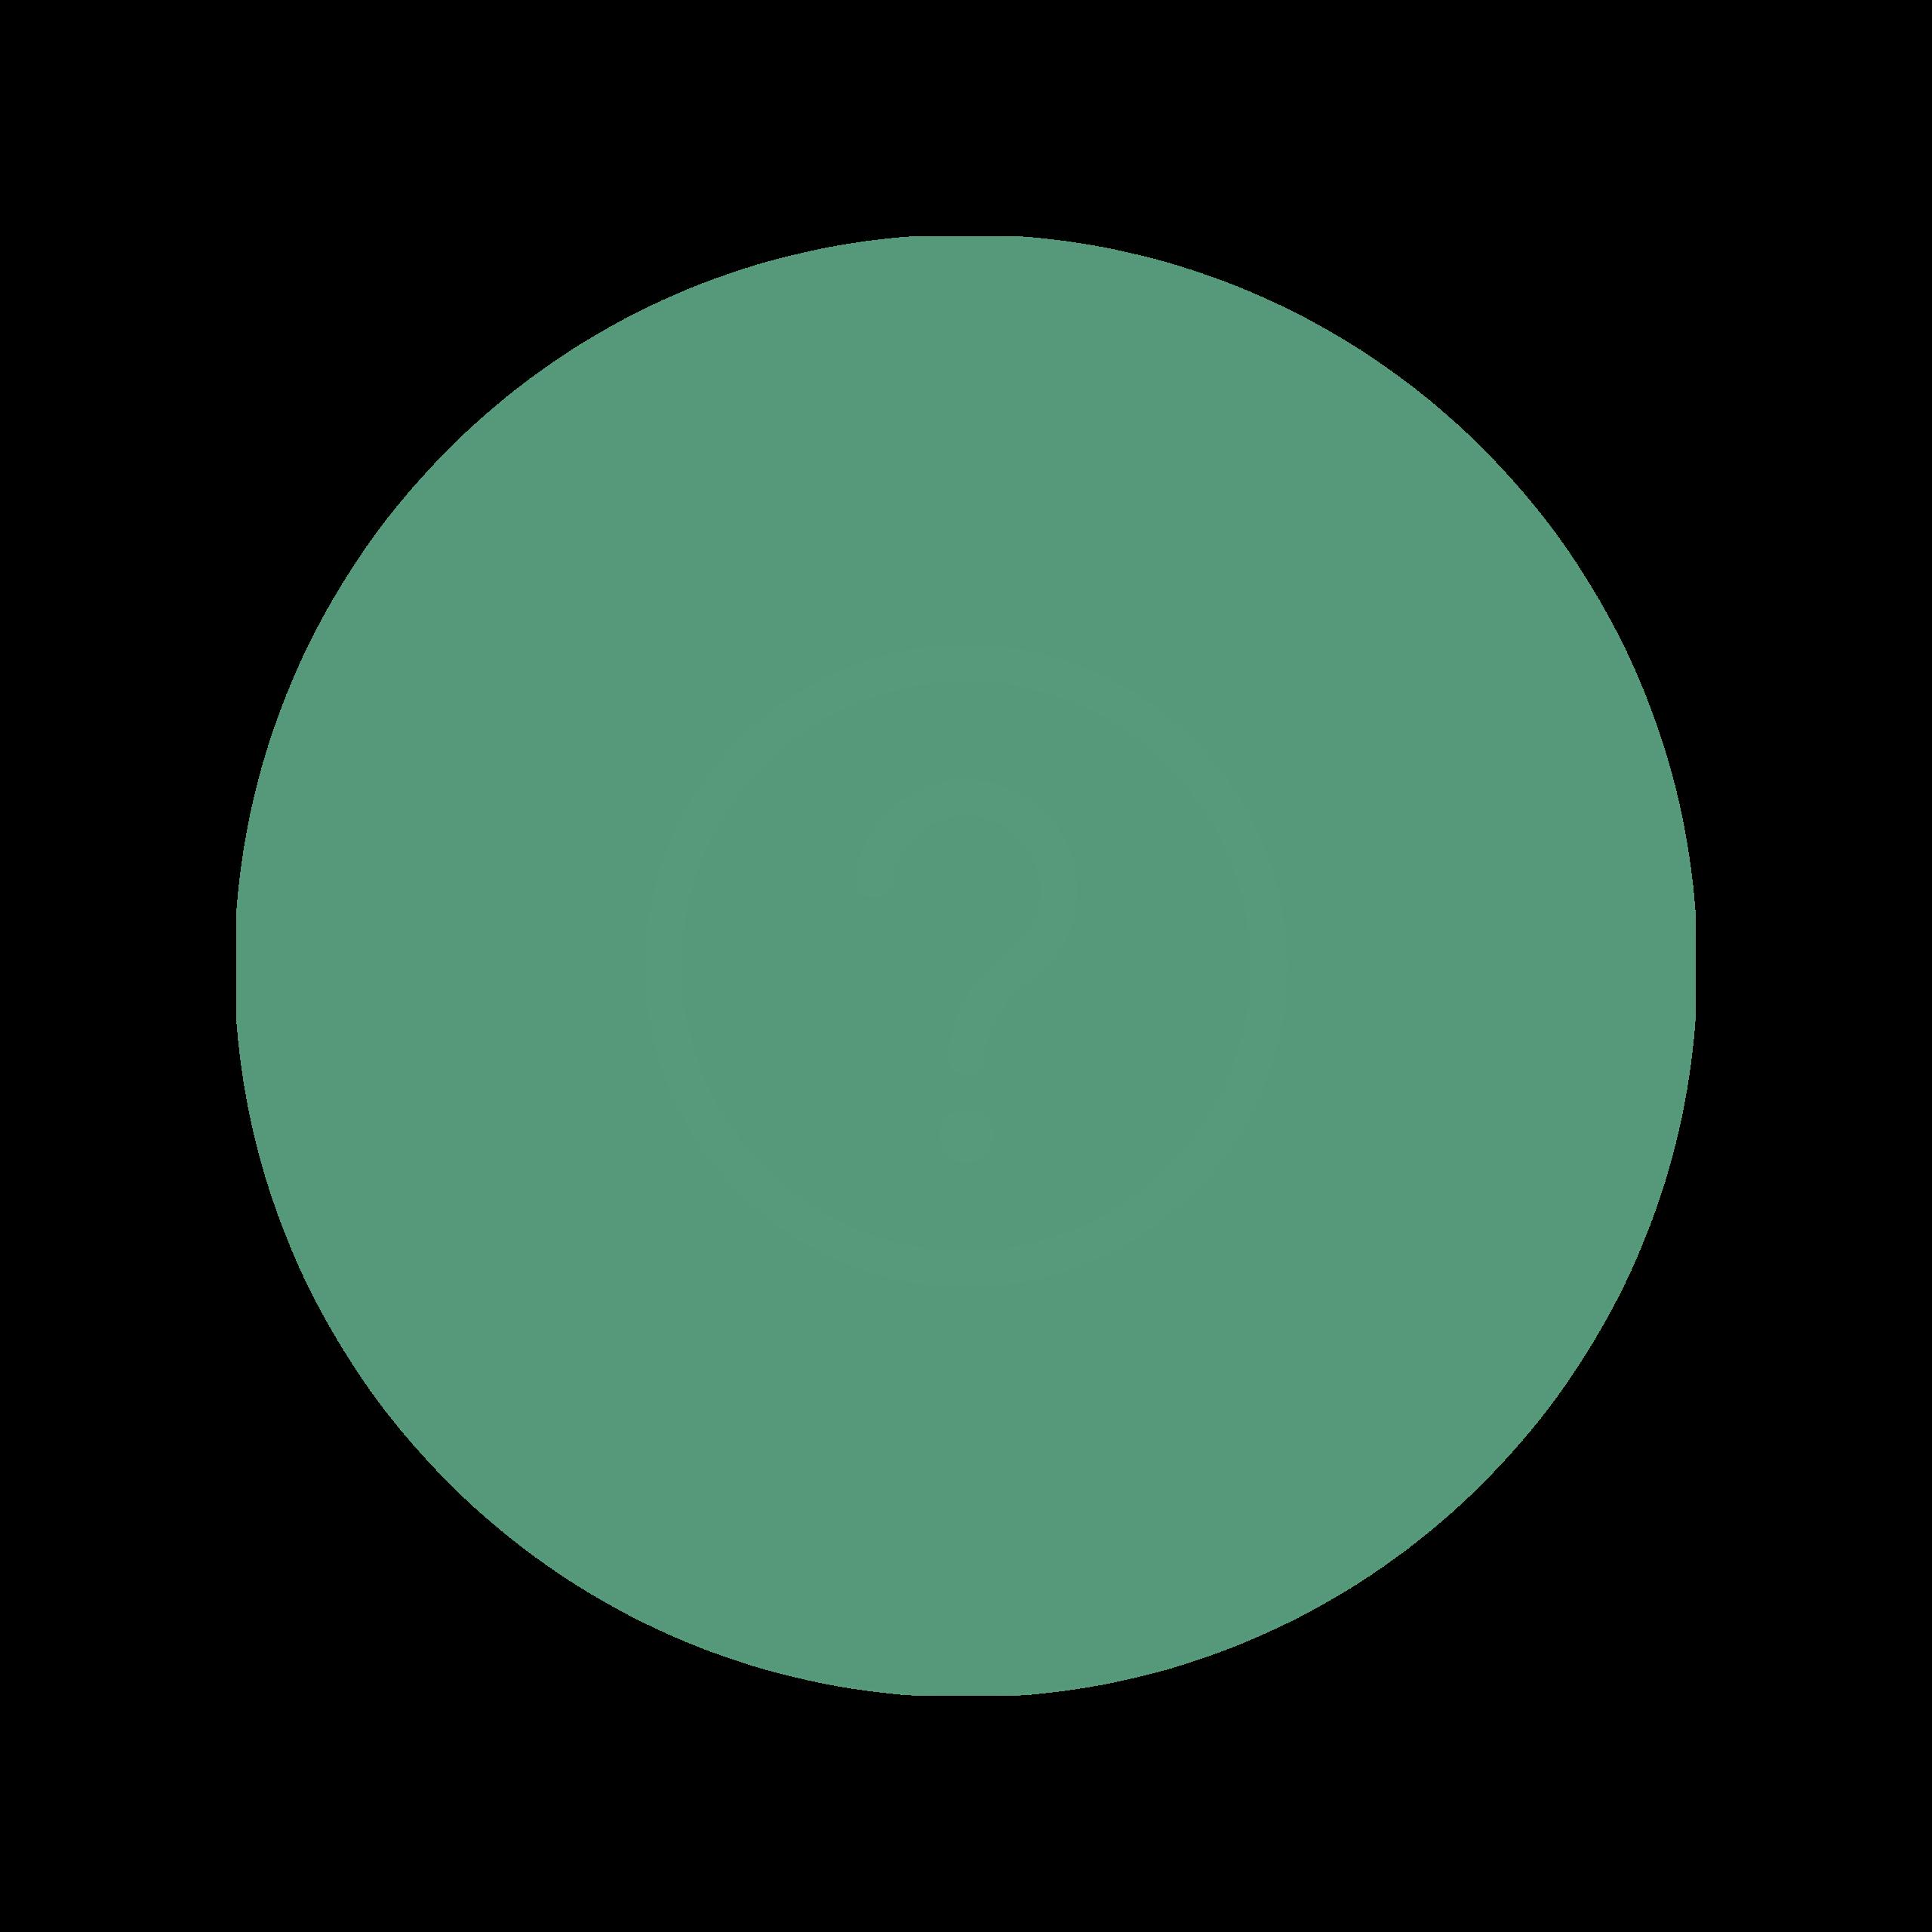 Circle Question Mark